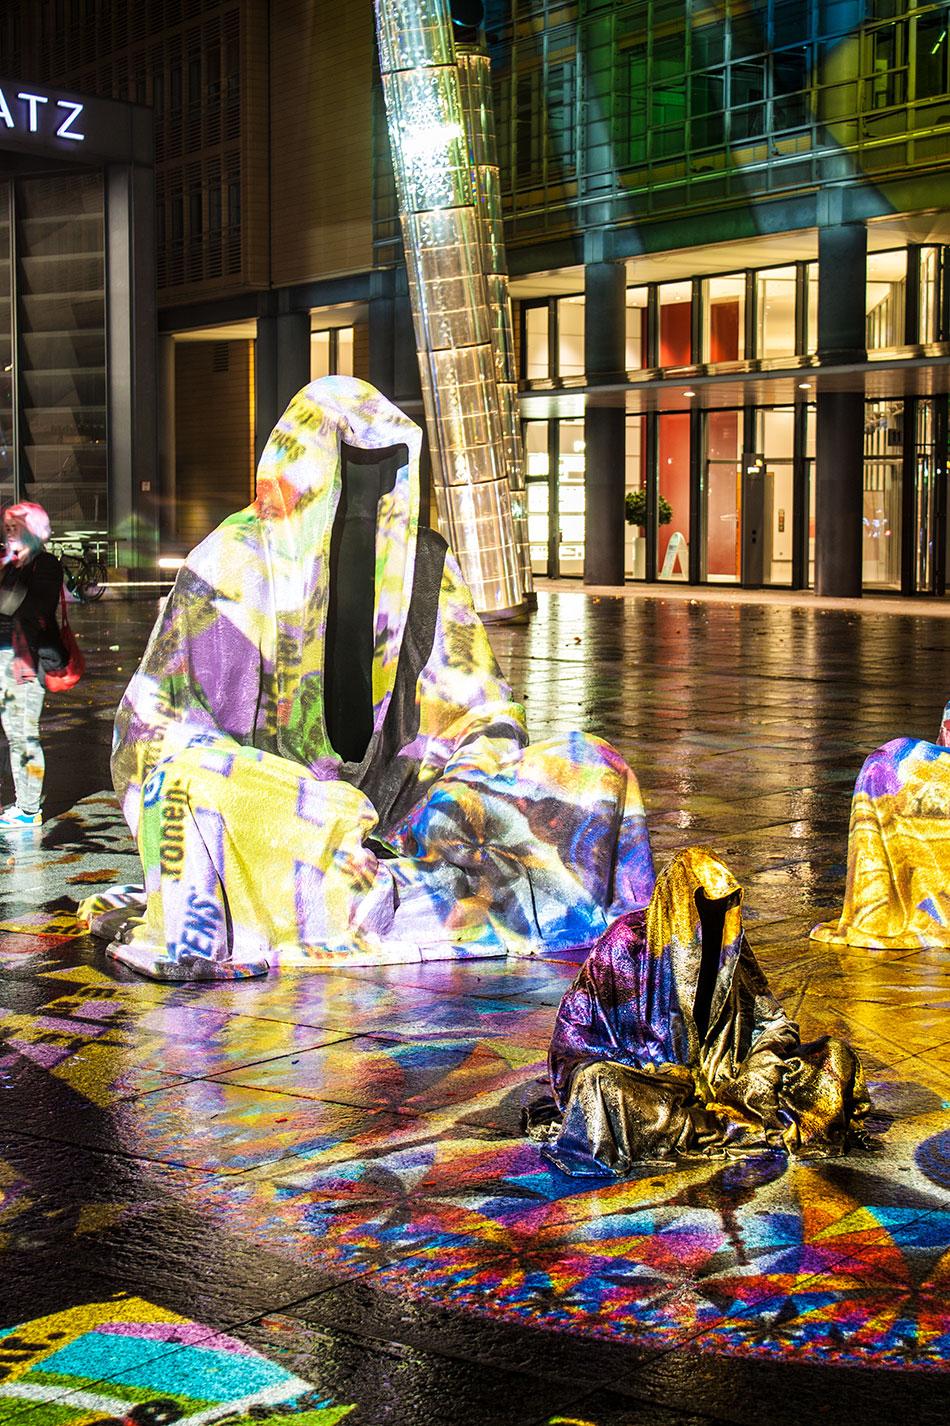 festival-of-lights-berlin-light-art-festival-contemporary-fine-art-design-show-large-scale-sculpture-guardiansof-time-manfred-kili-kielnhofer-sculpture-3882